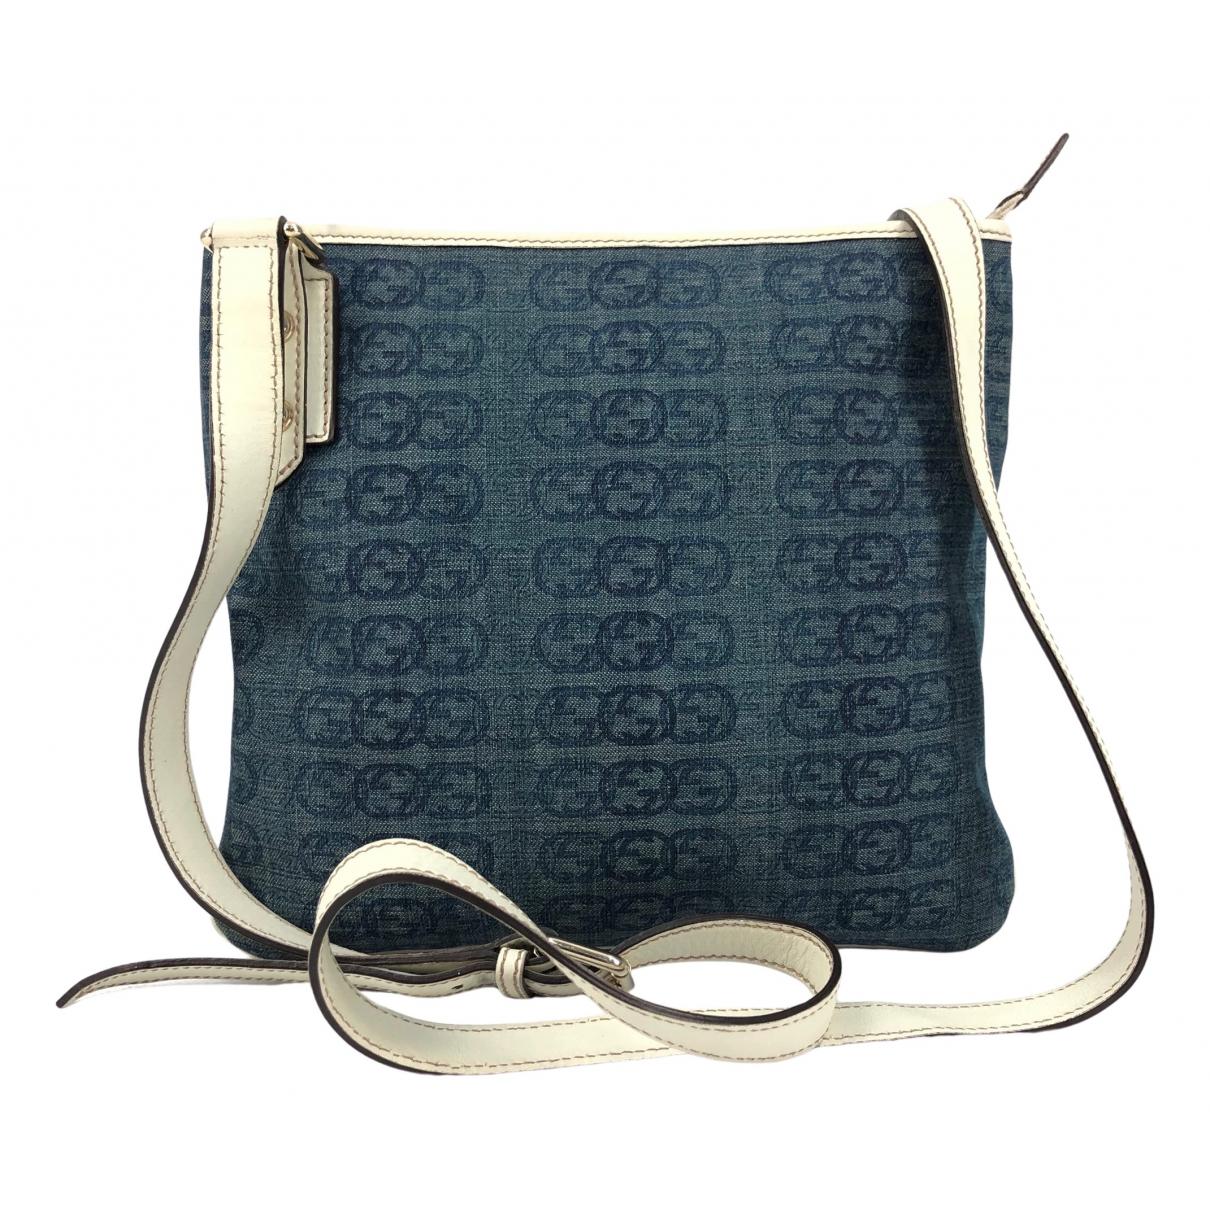 Gucci \N Blue Denim - Jeans handbag for Women \N